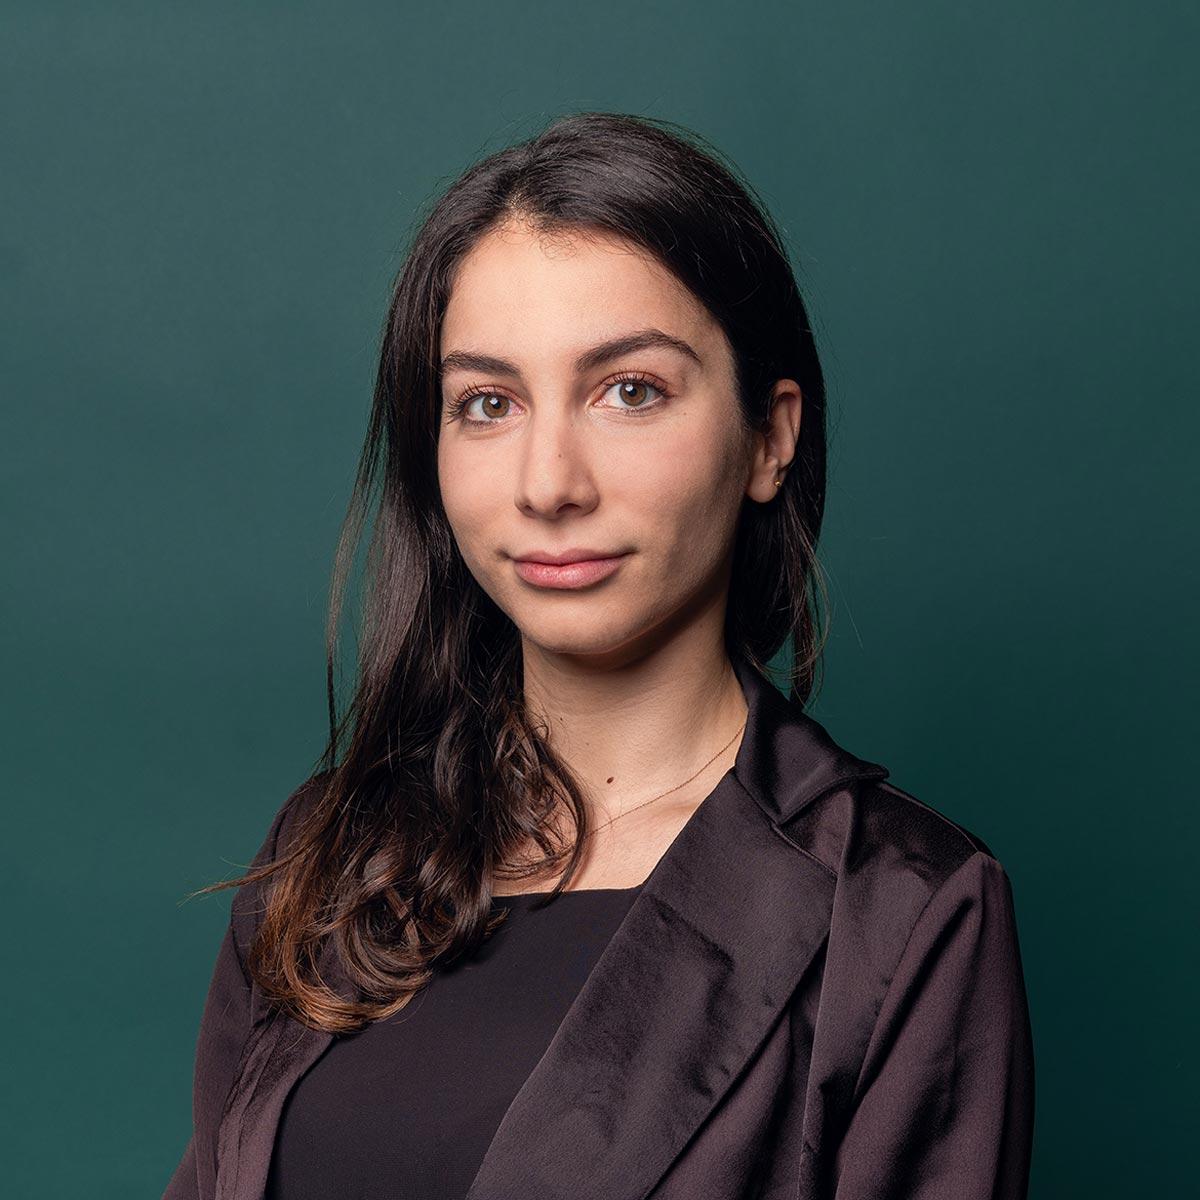 Dafni Kachrila Skouteli